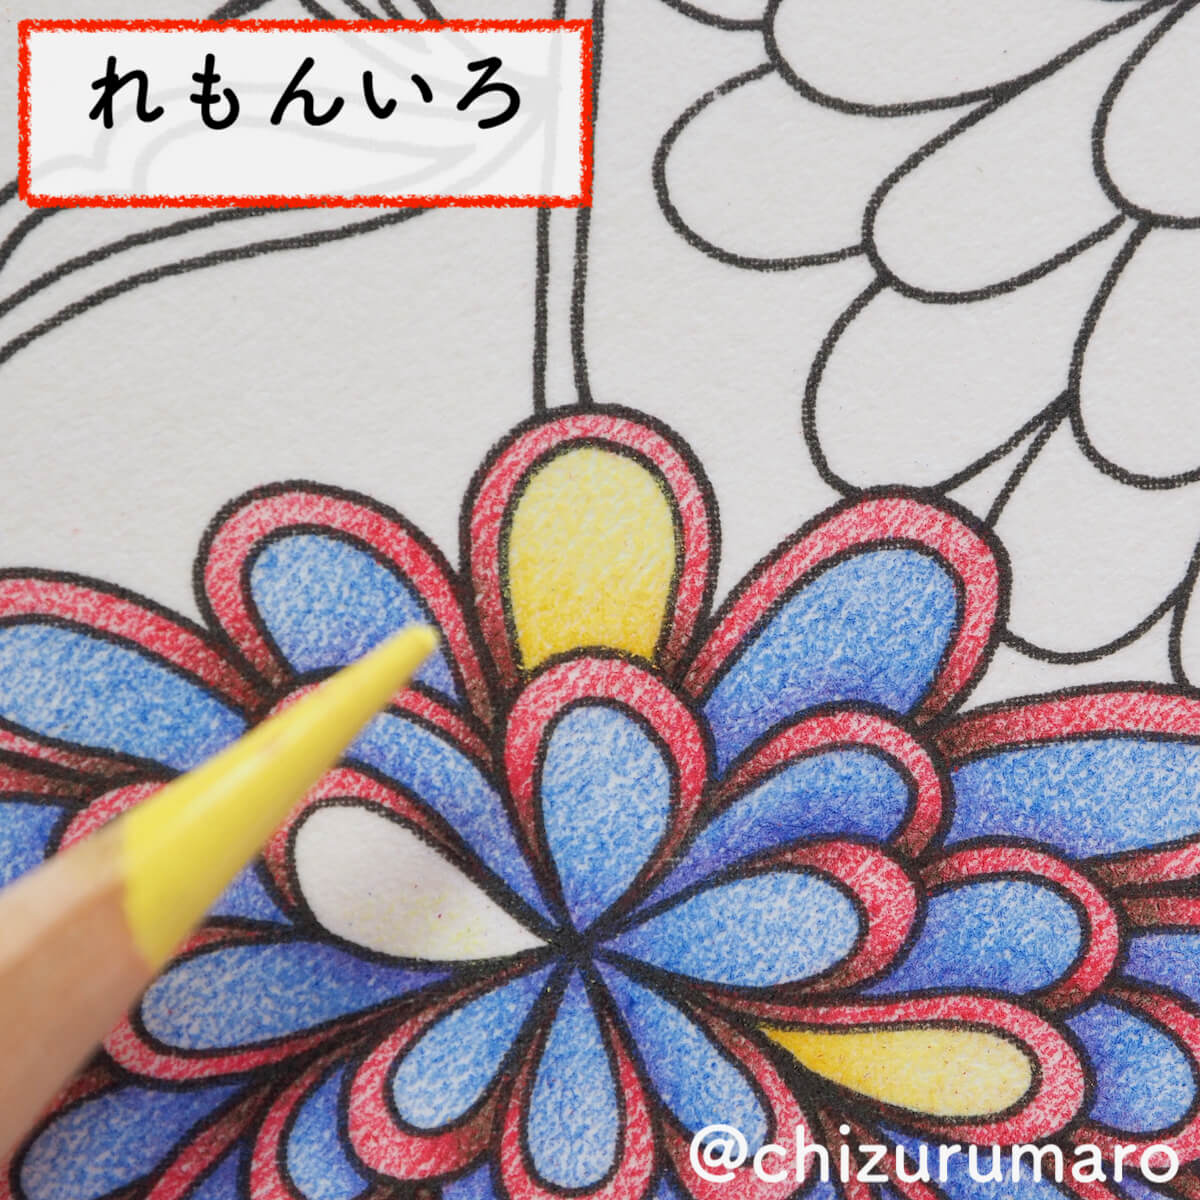 f:id:chizurumaro:20200404113313j:plain